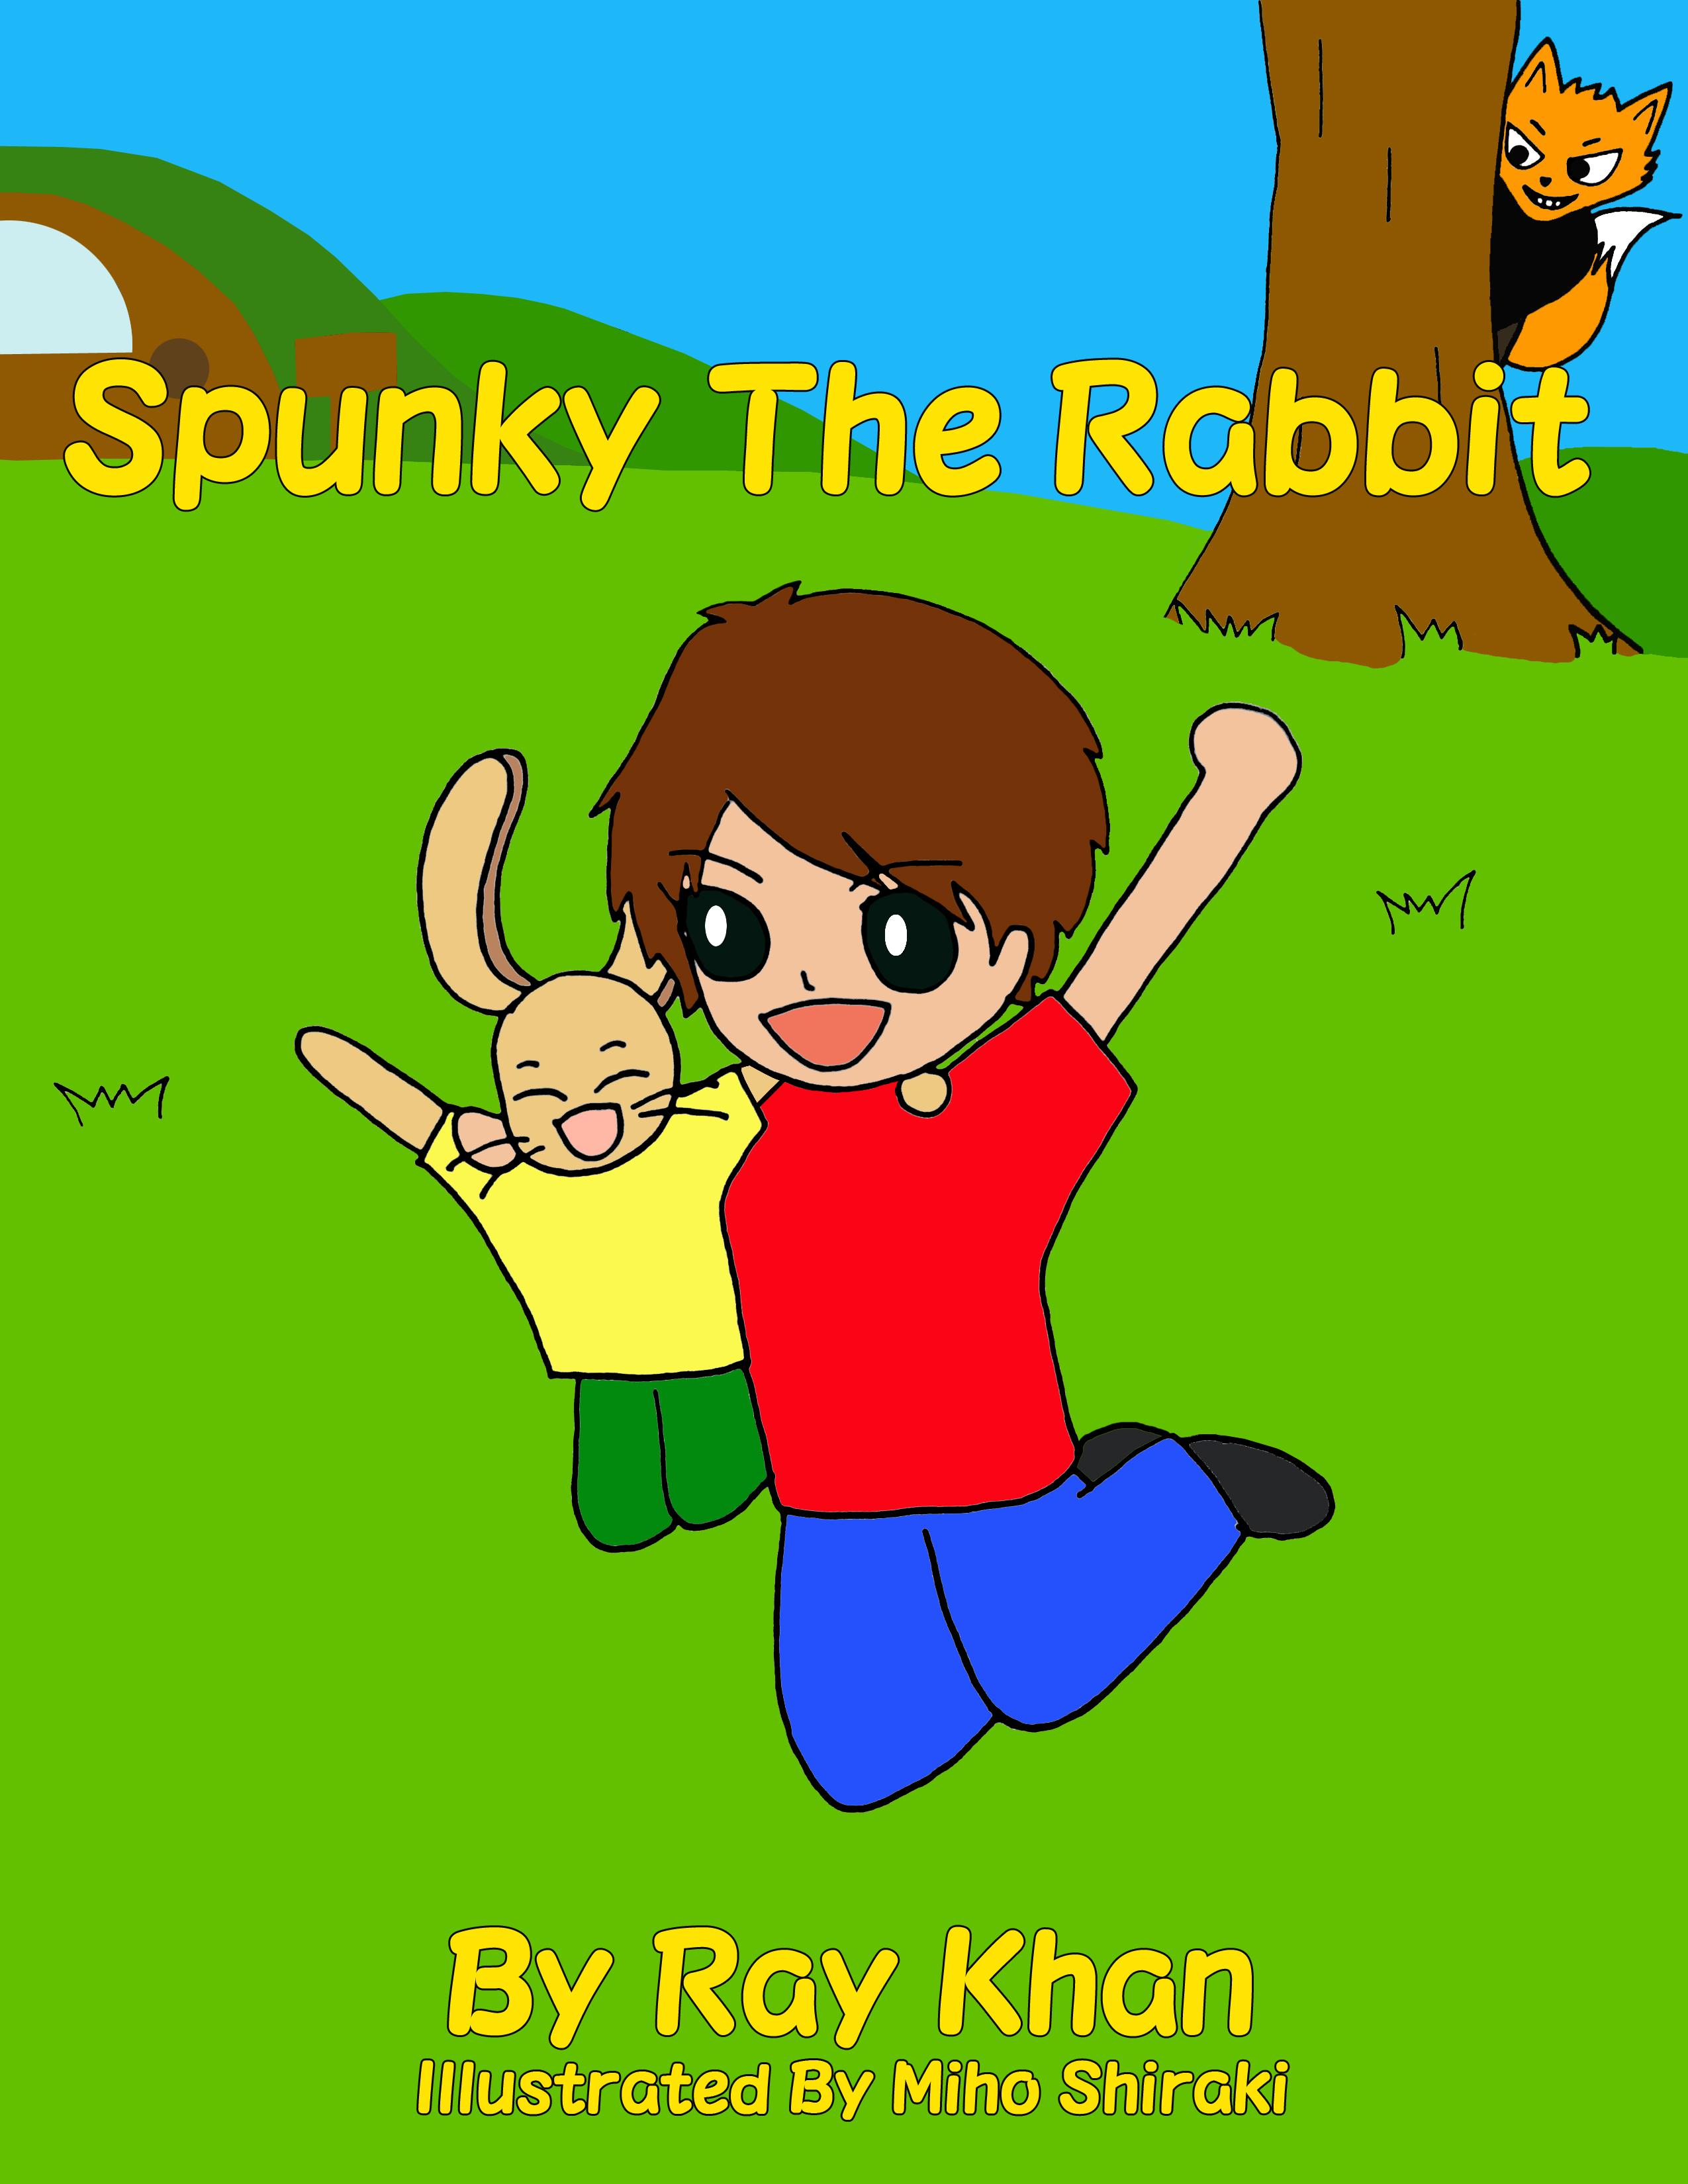 Spunky The Rabbit